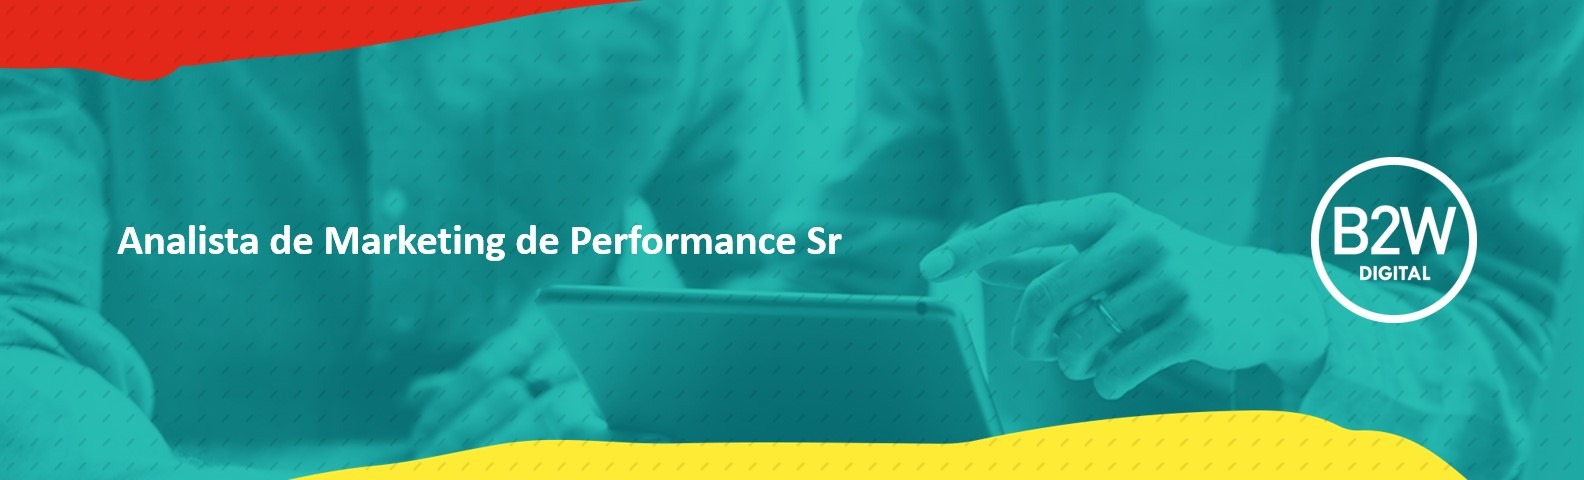 Analista de Marketing de Performance Sr